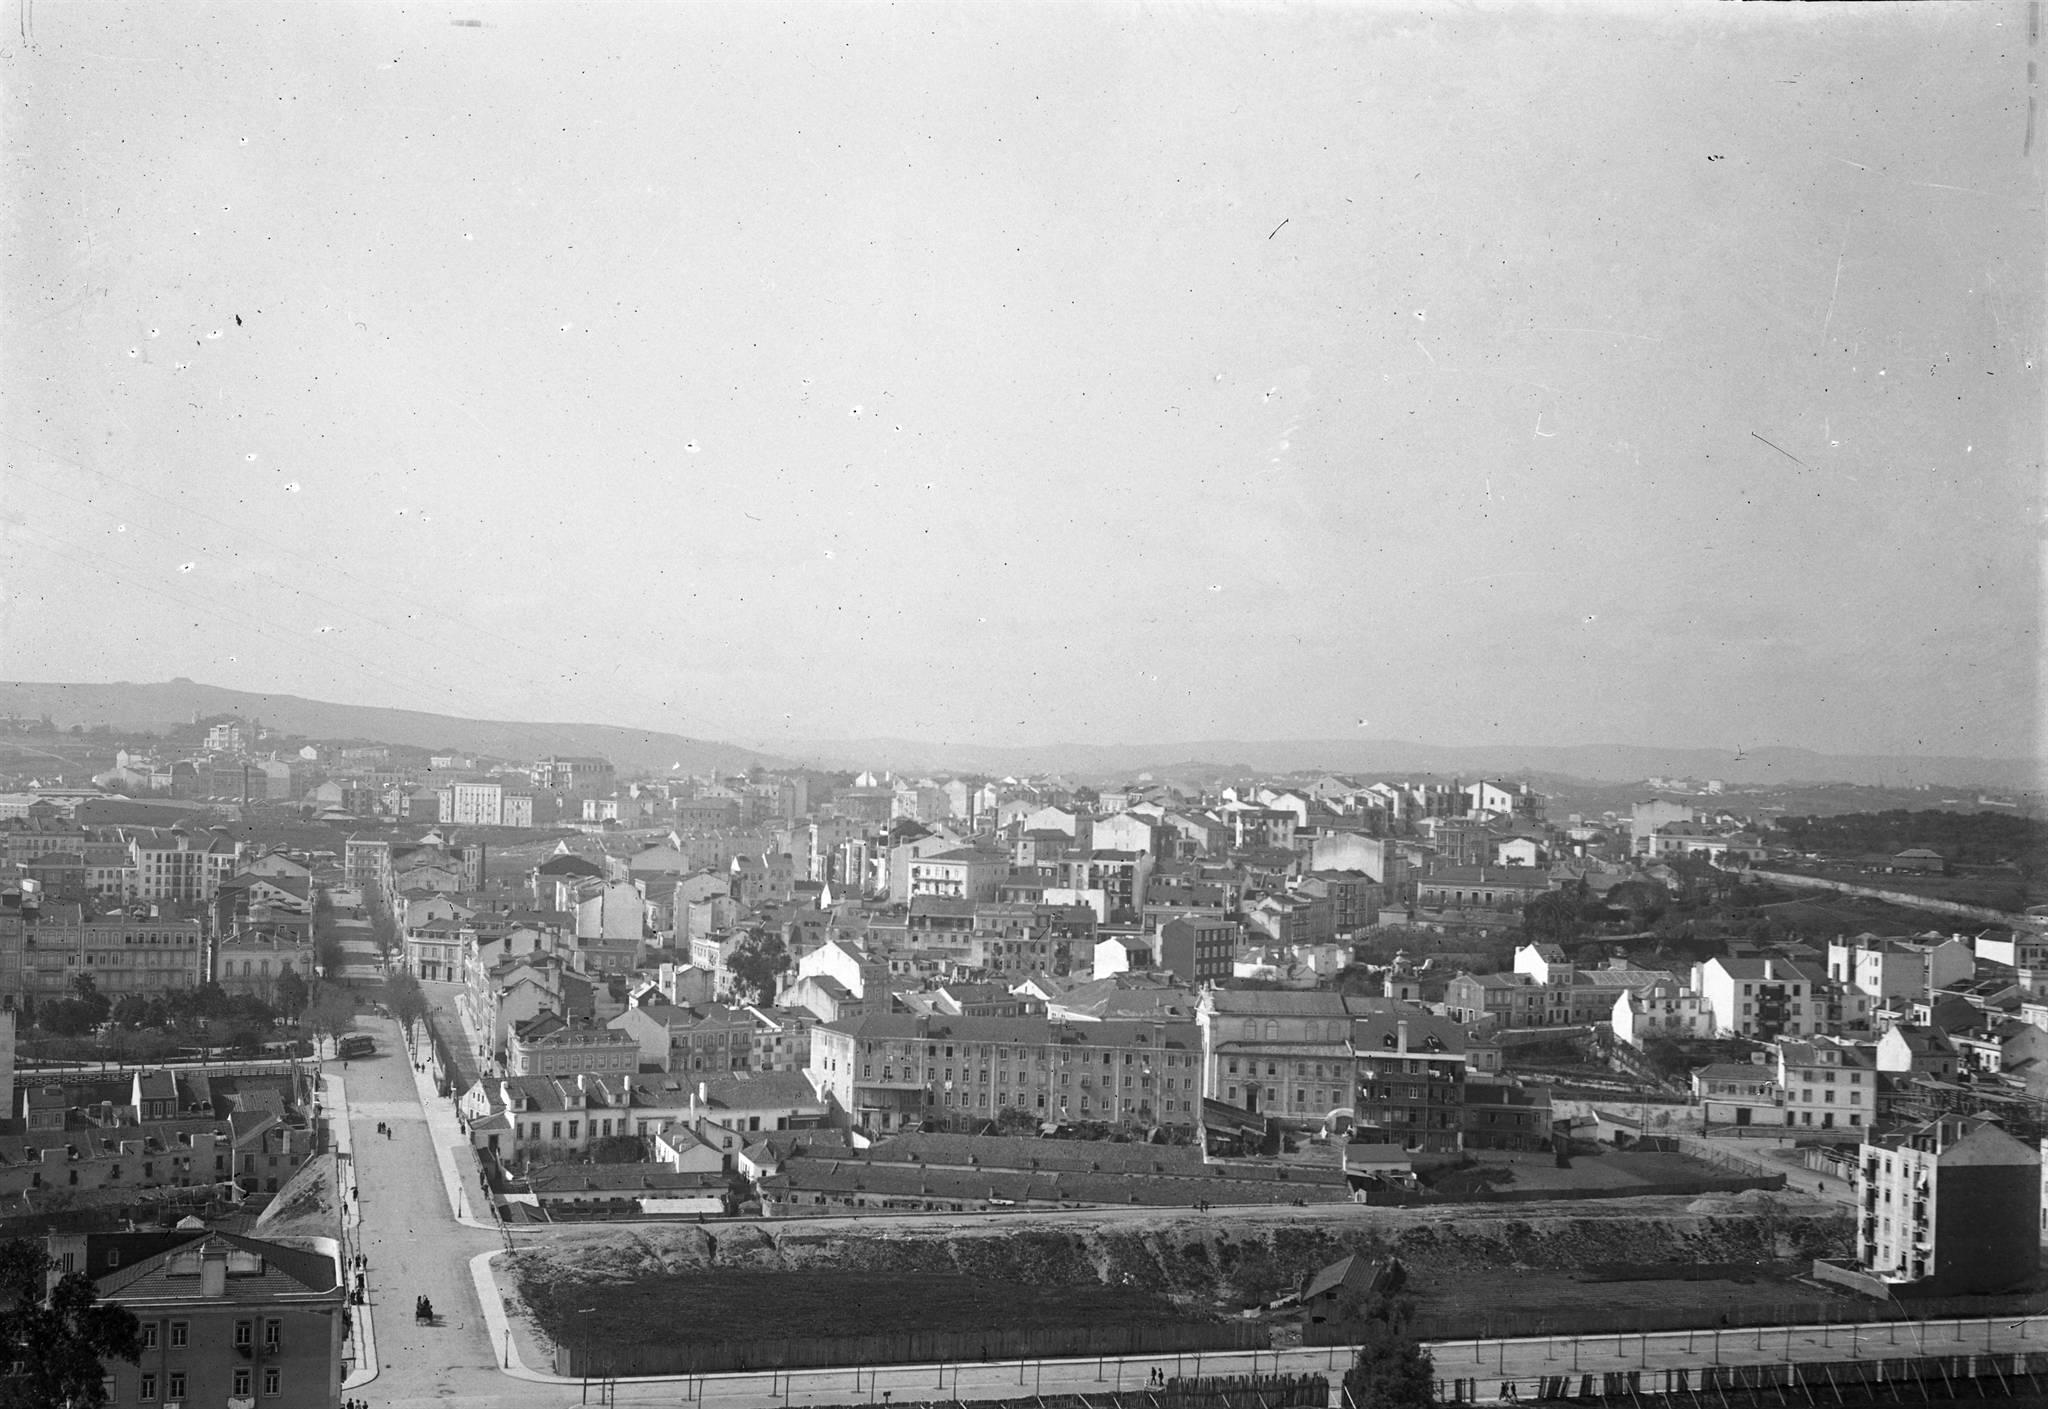 Vista sobre a Rua de Paschoal de Mello, Arroios (José Arthur Leitão Barcia, c. 1908)